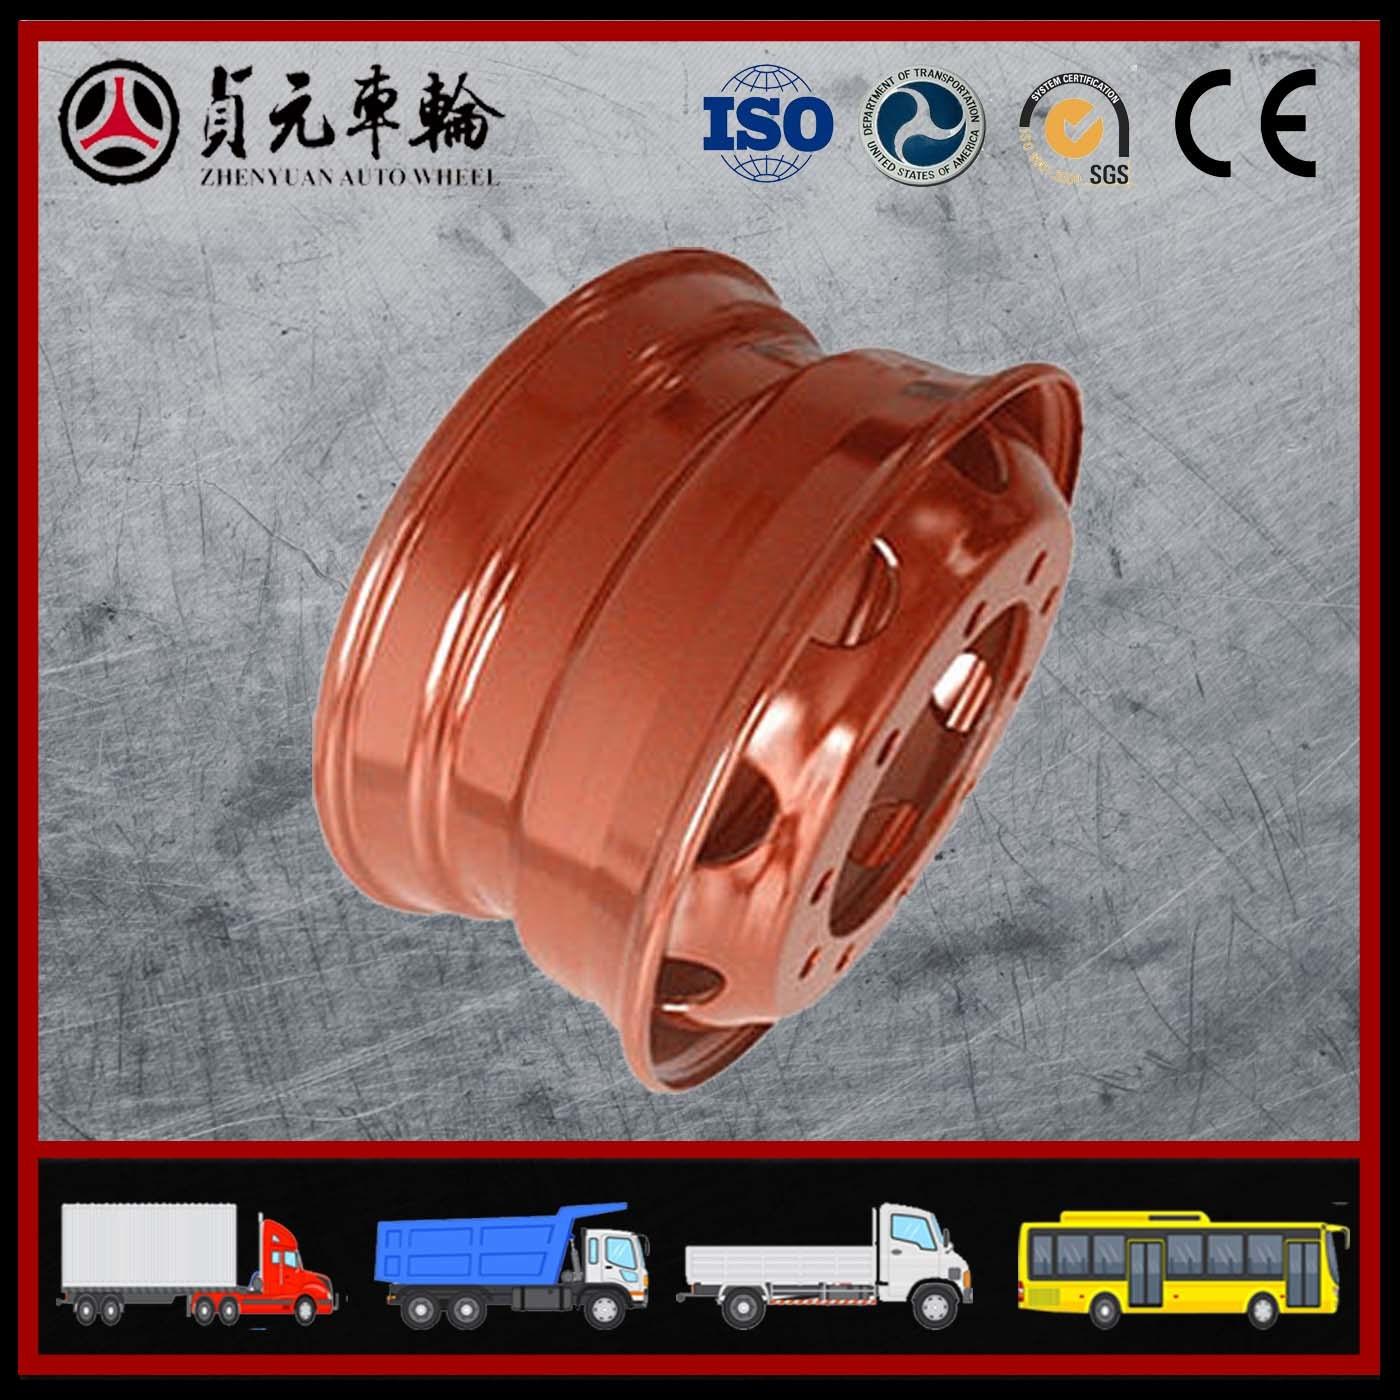 Truck Wheel and Steel Wheel Shandong Zhenyuan Wheel (24.5*8.25)